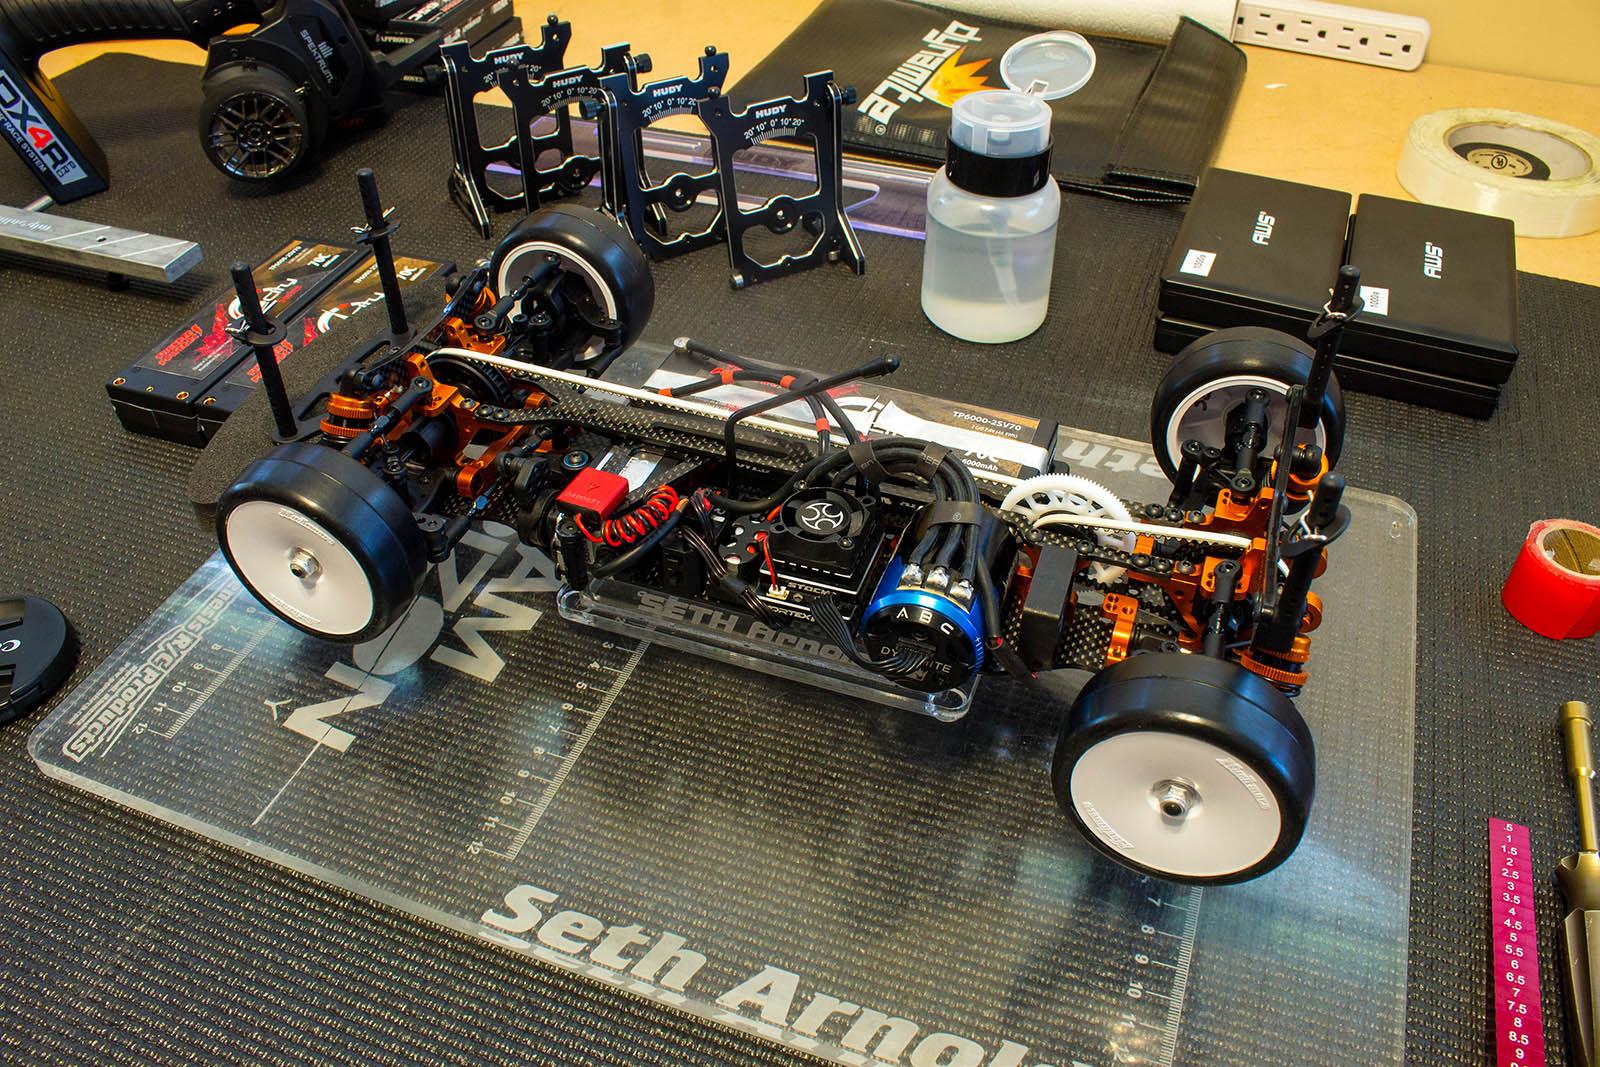 Team Xray T4'16 - Seth Arnold - Build